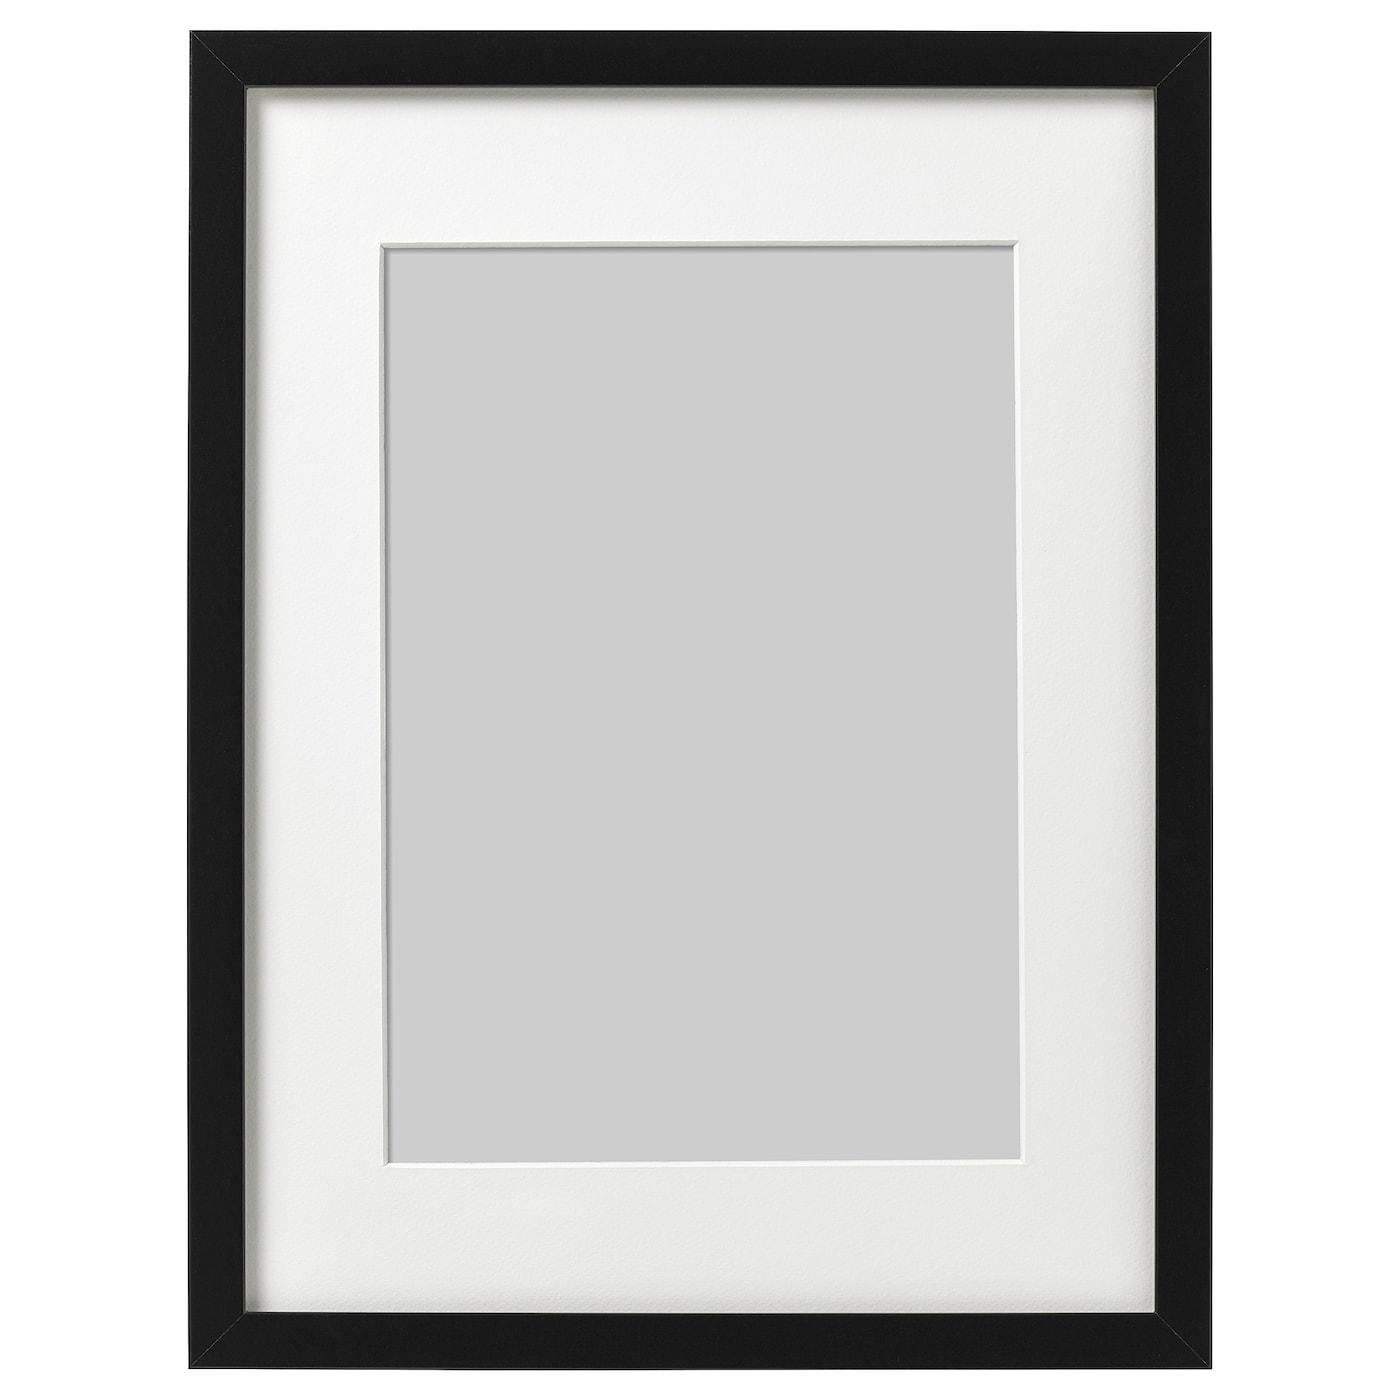 Ribba Frame Black 30x40 Cm Ikea